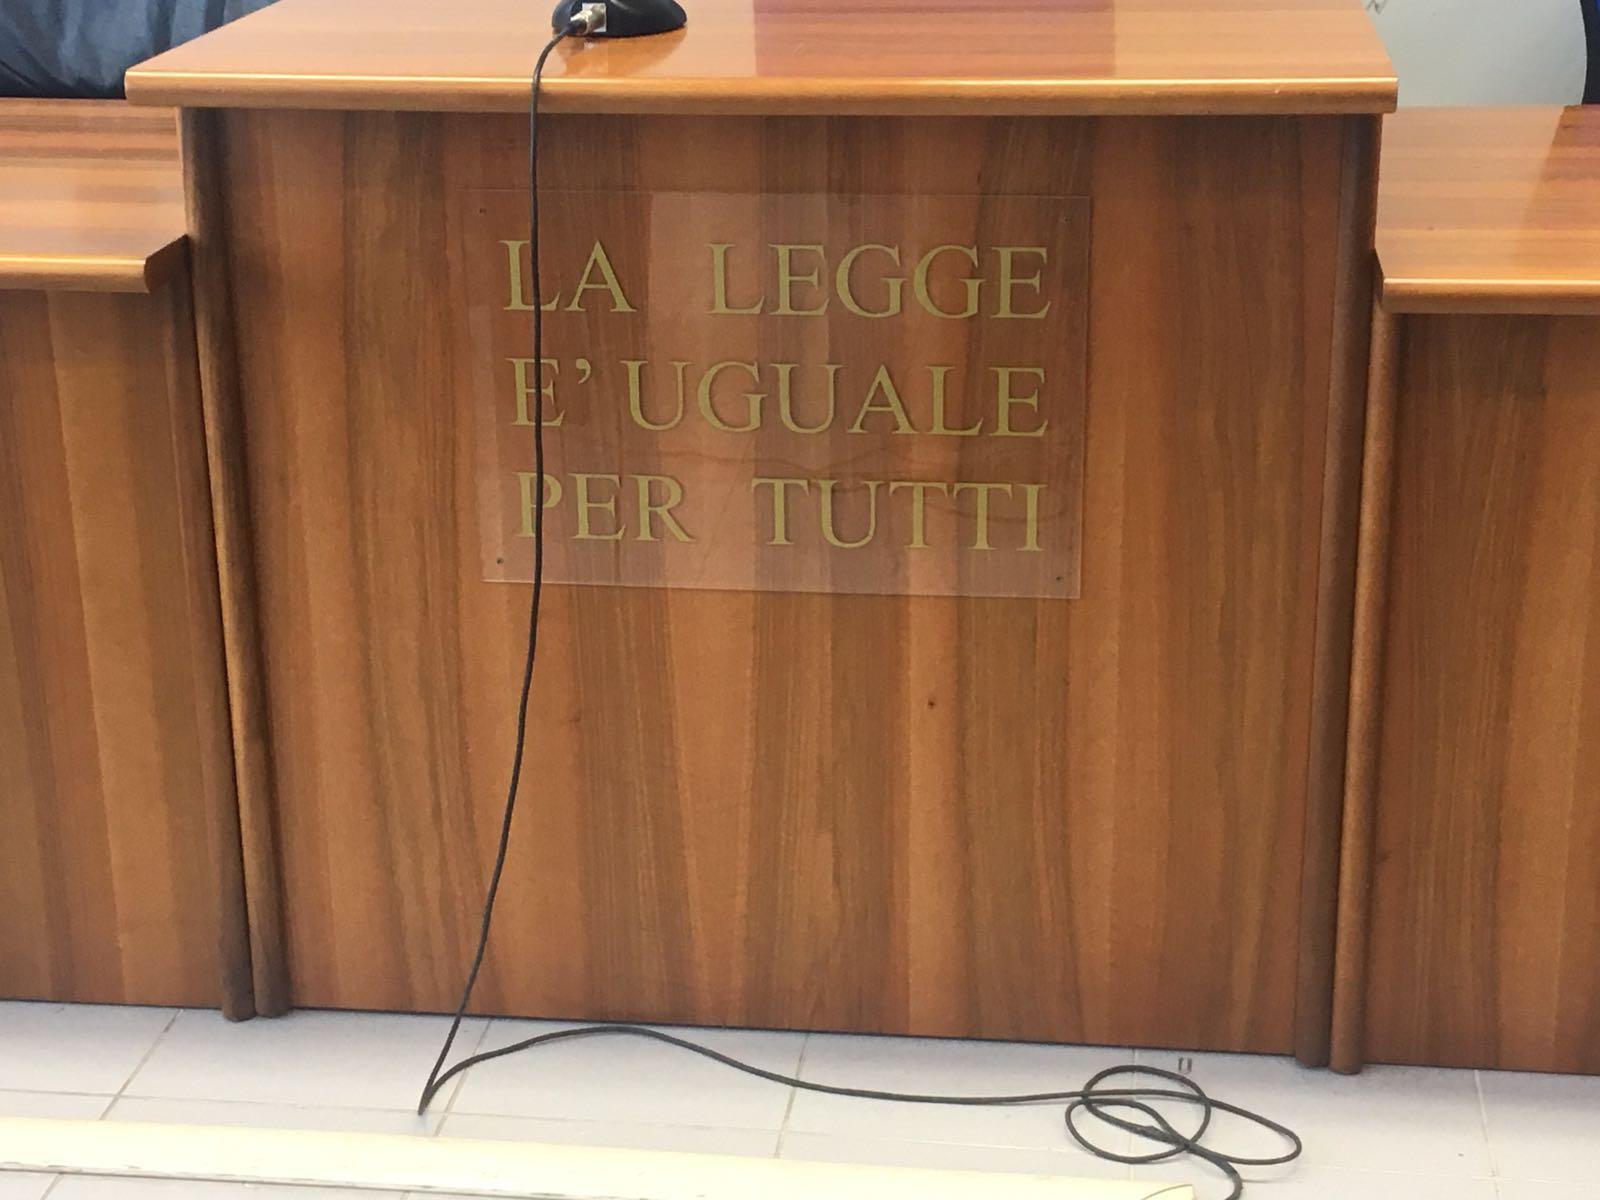 Tangenti sanità:tre assolti a Foggia